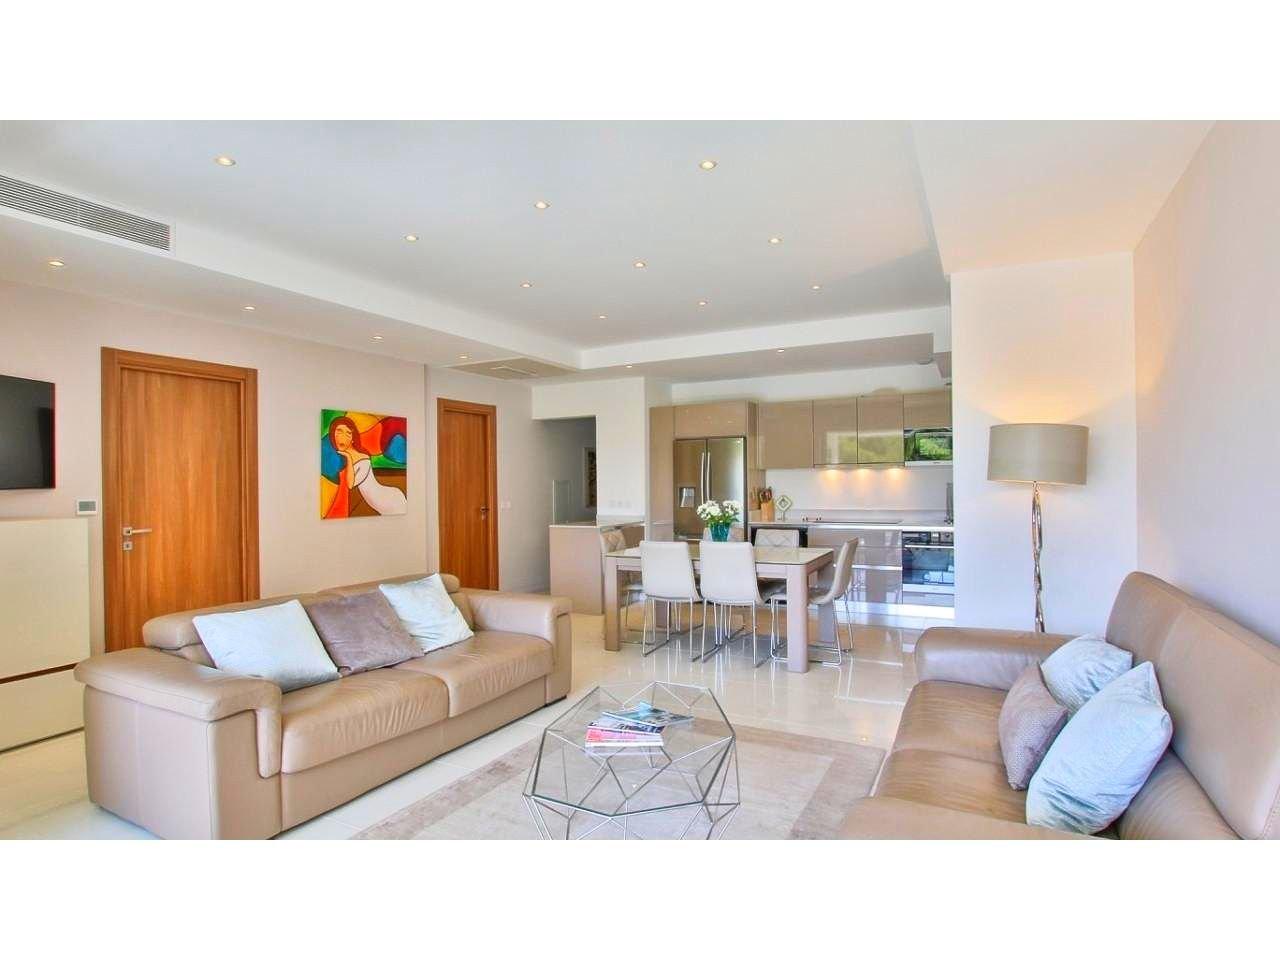 Vente Appartement Antibes Cap-d'Antibes